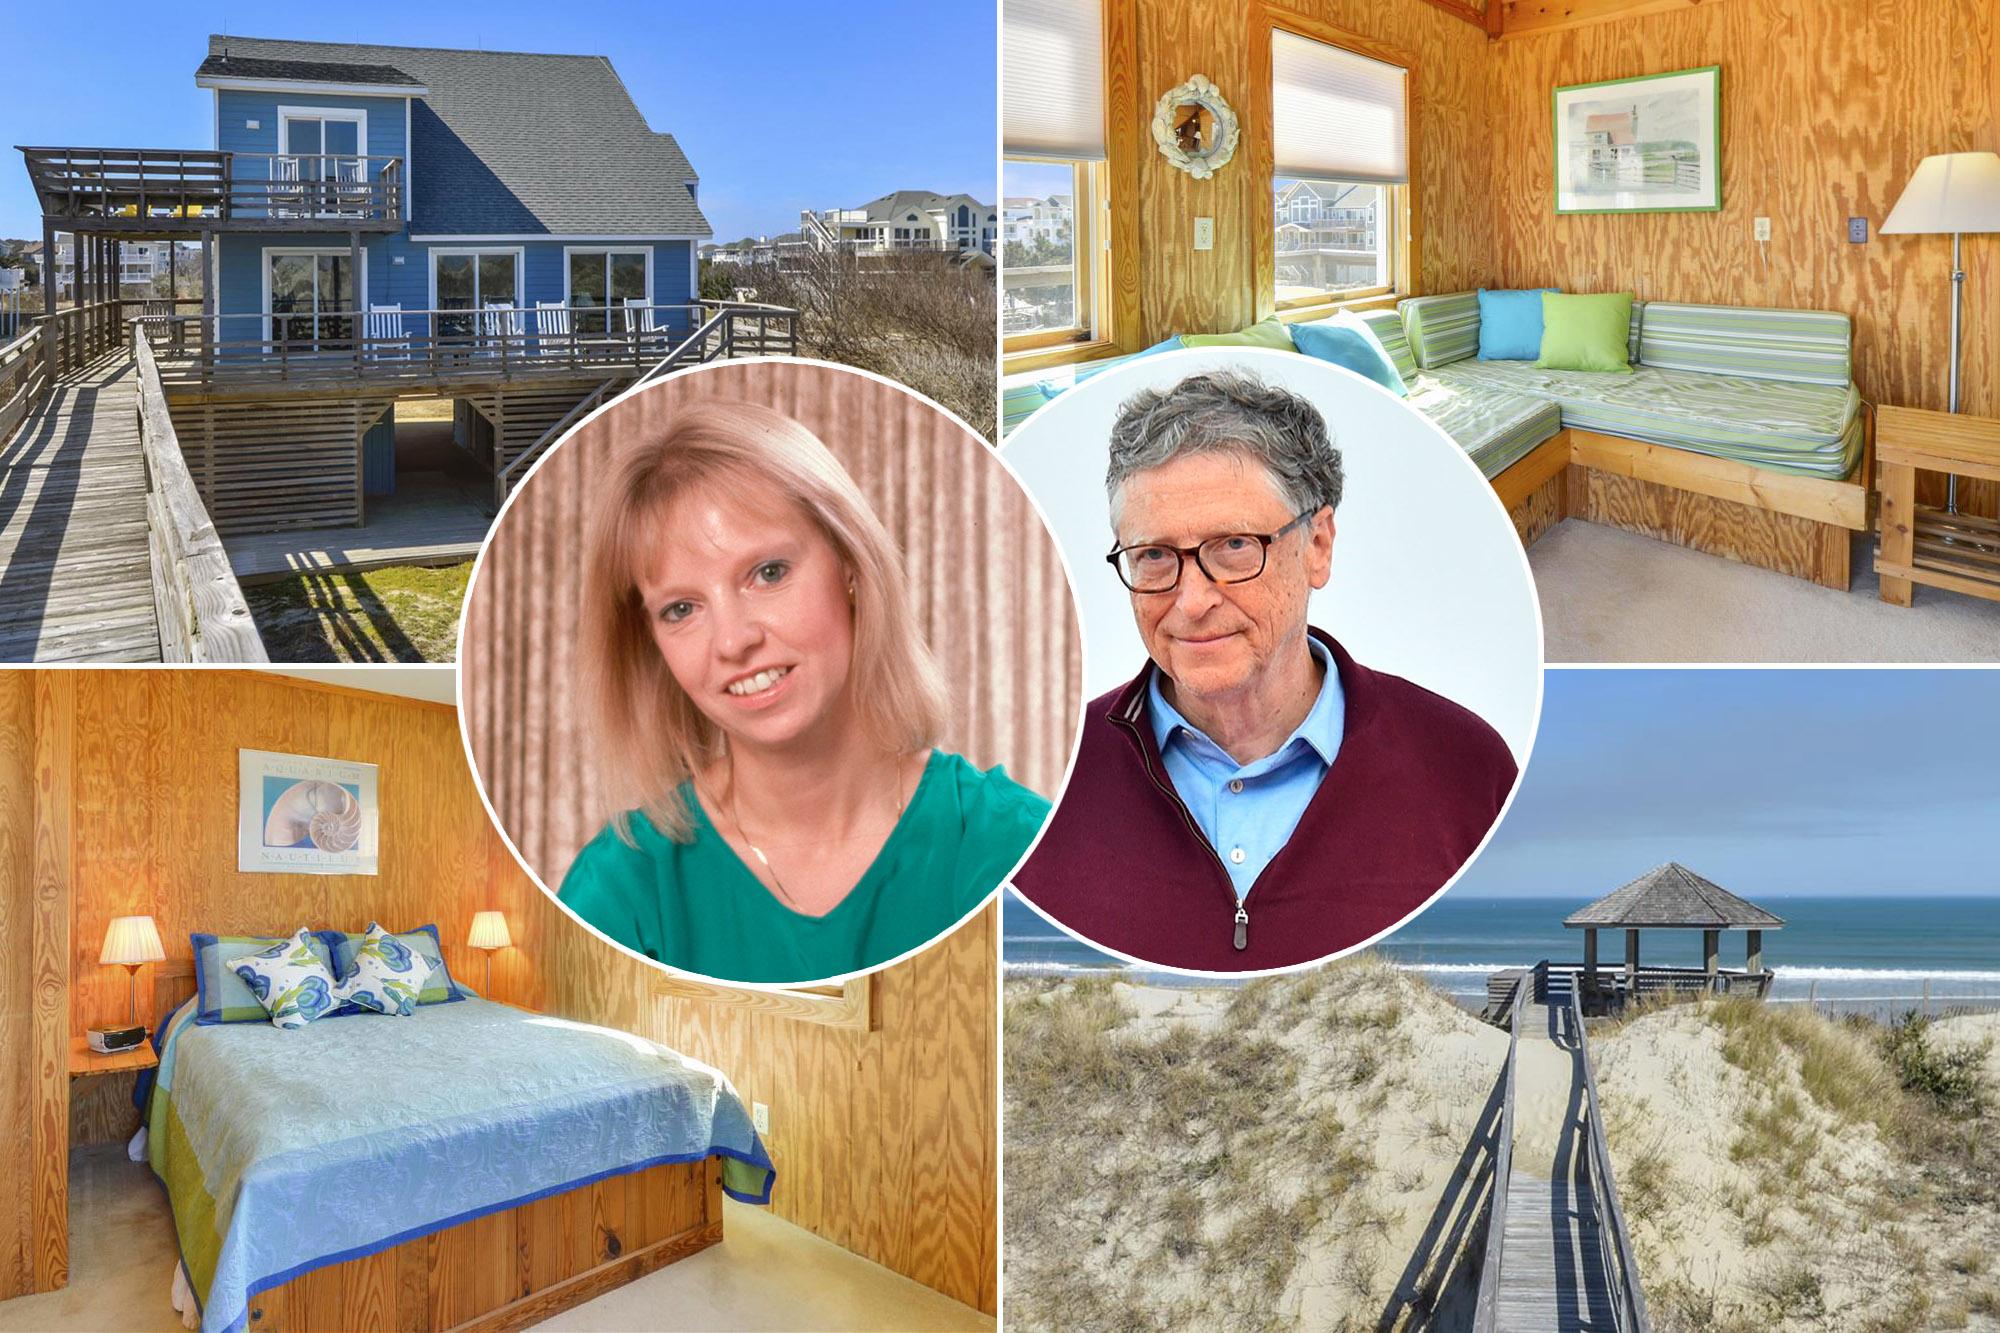 See inside Bill Gates' secret love nest with gal pal Ann Winblad